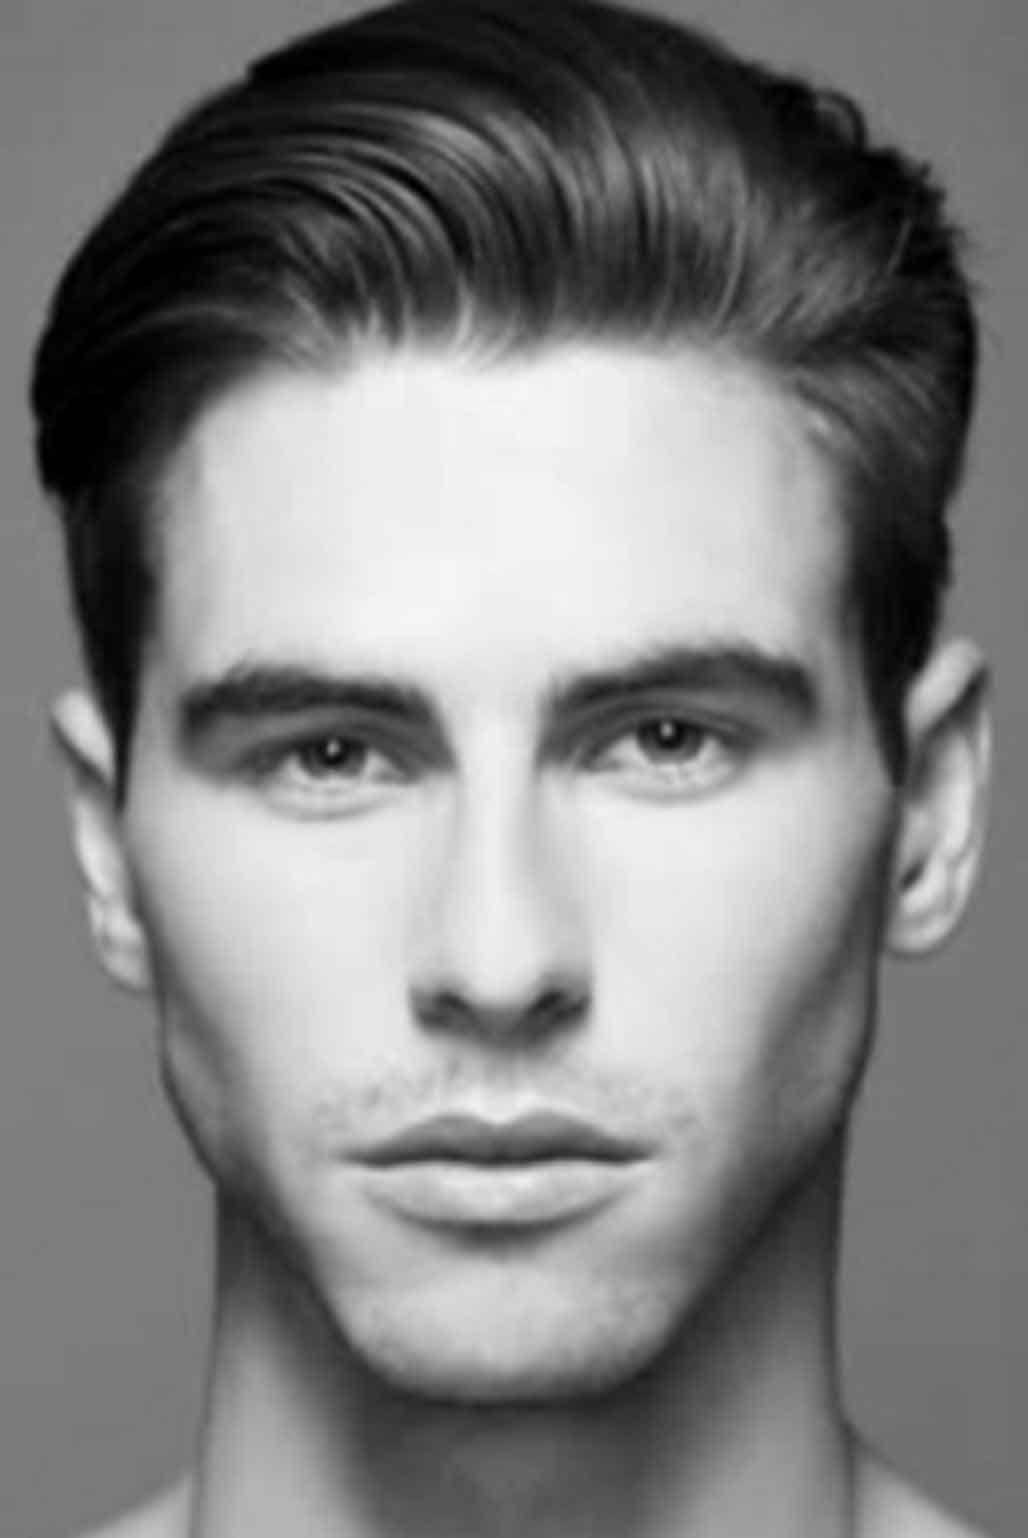 diamond face shape: narrow forehead and chin, extreme width